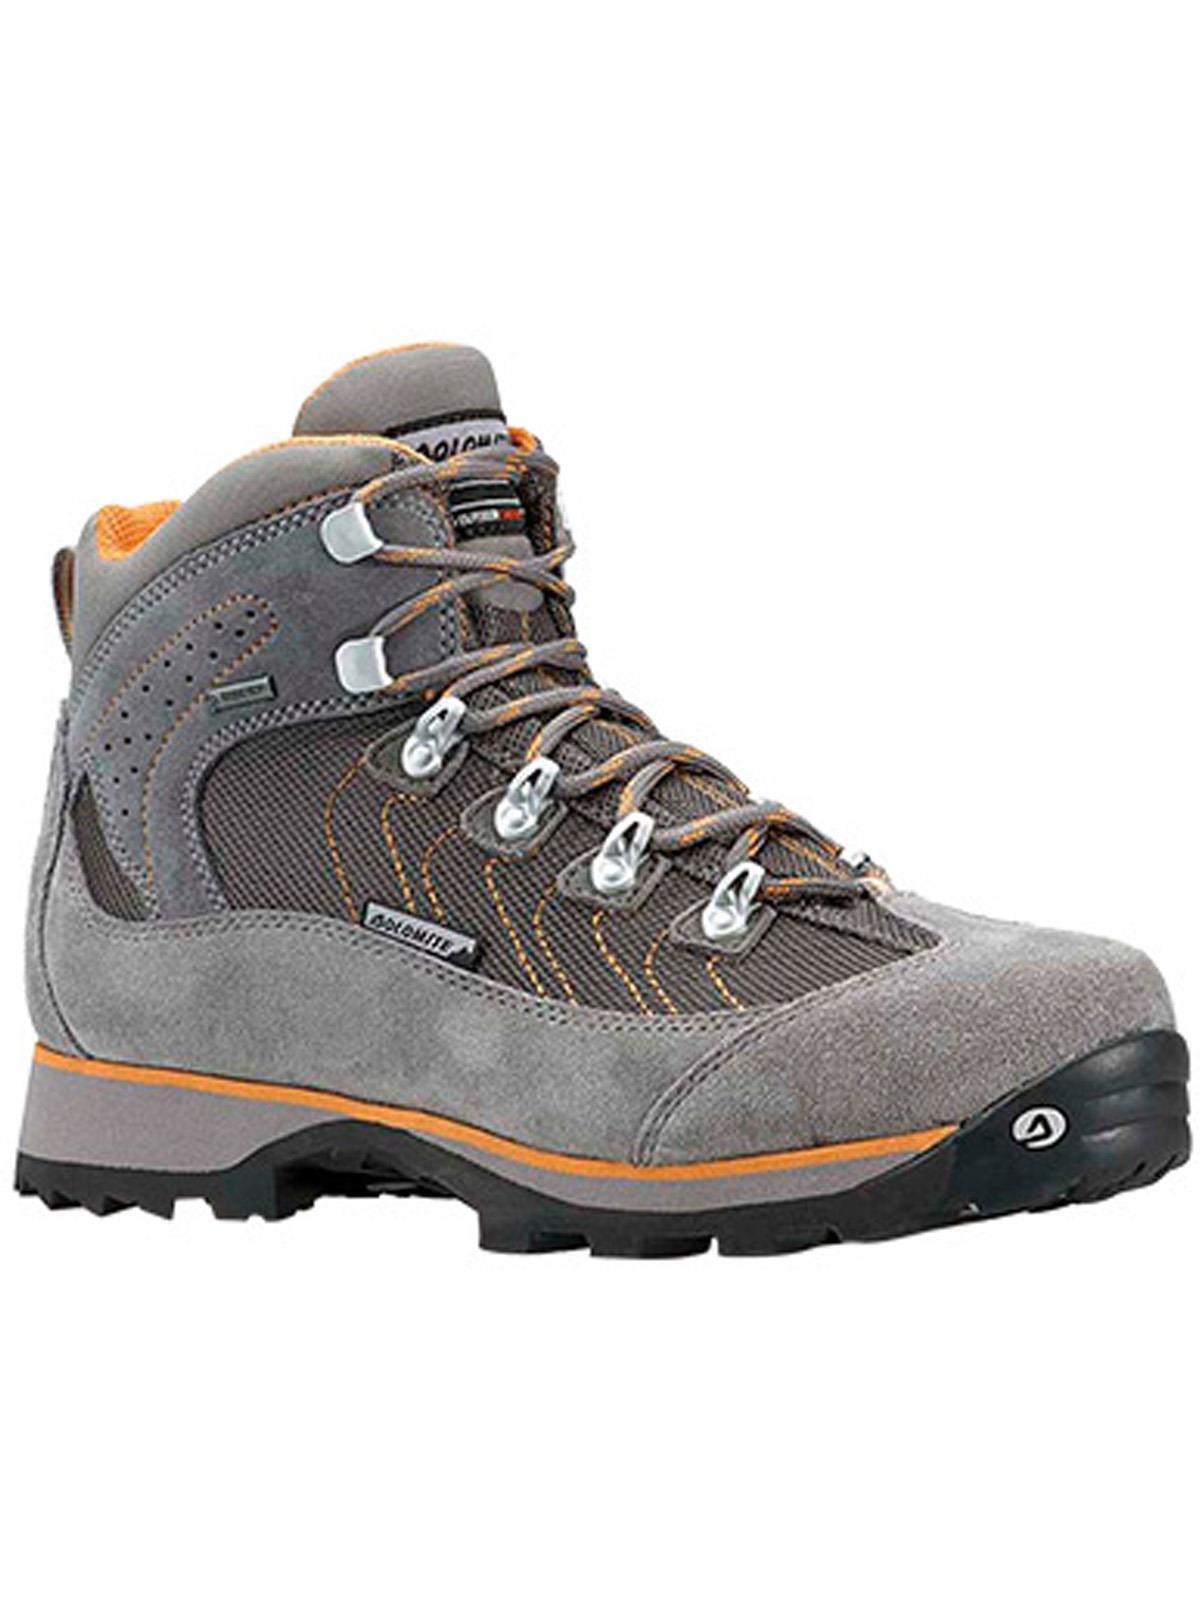 Dolomite Genzianella Gtx wmn Scarpa da Trekking women 24794704440